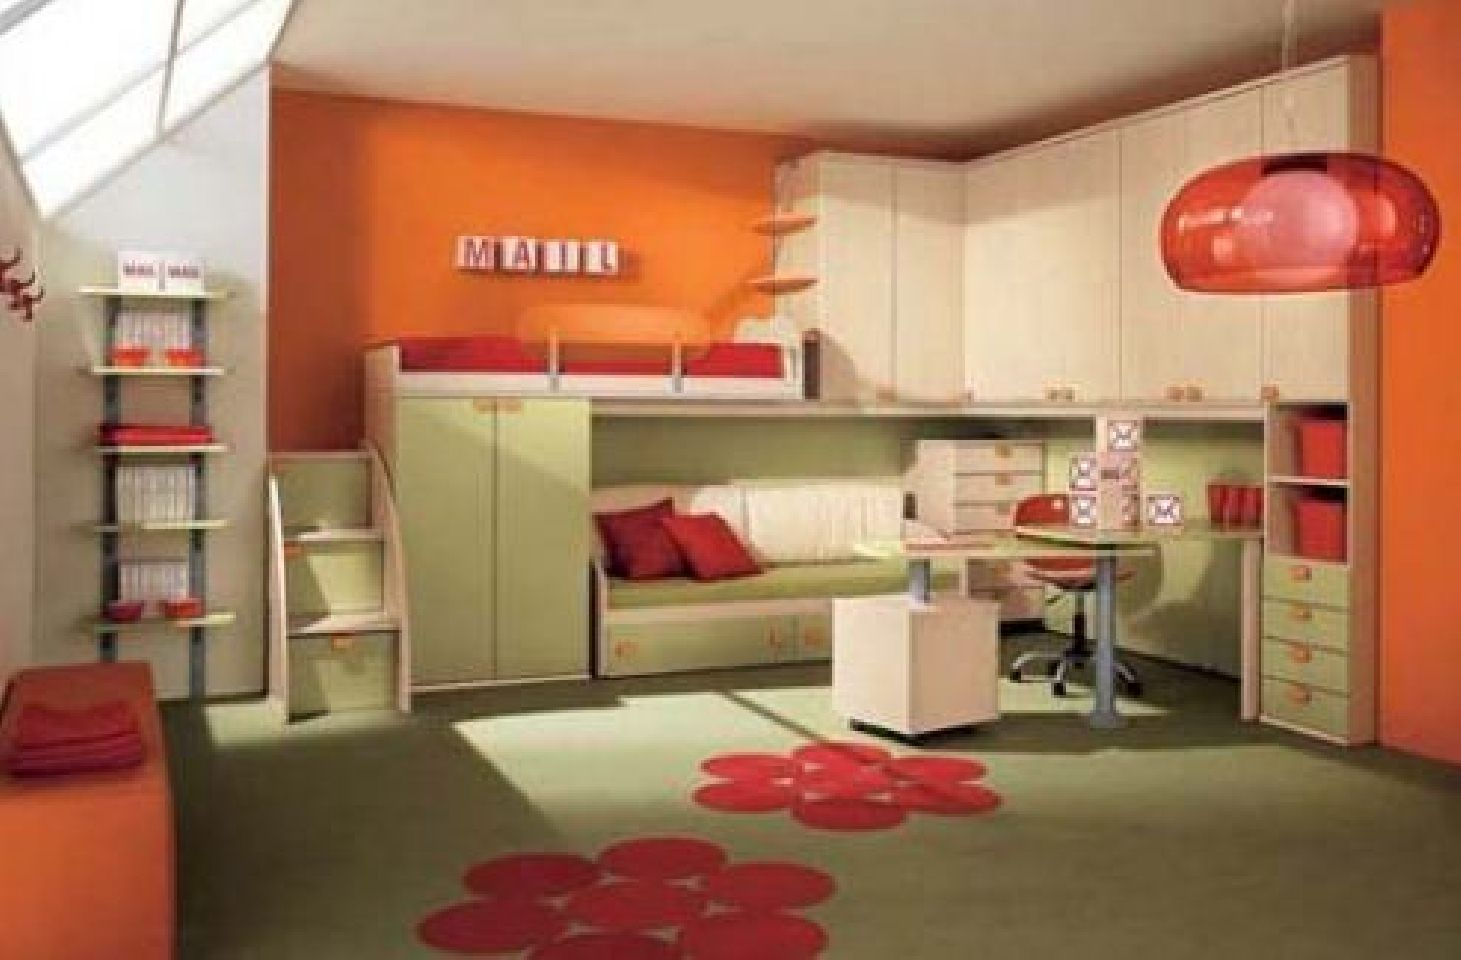 Interior design of children's bedroom childrens bedroom furniture ideas with bedroom idea by arredissima